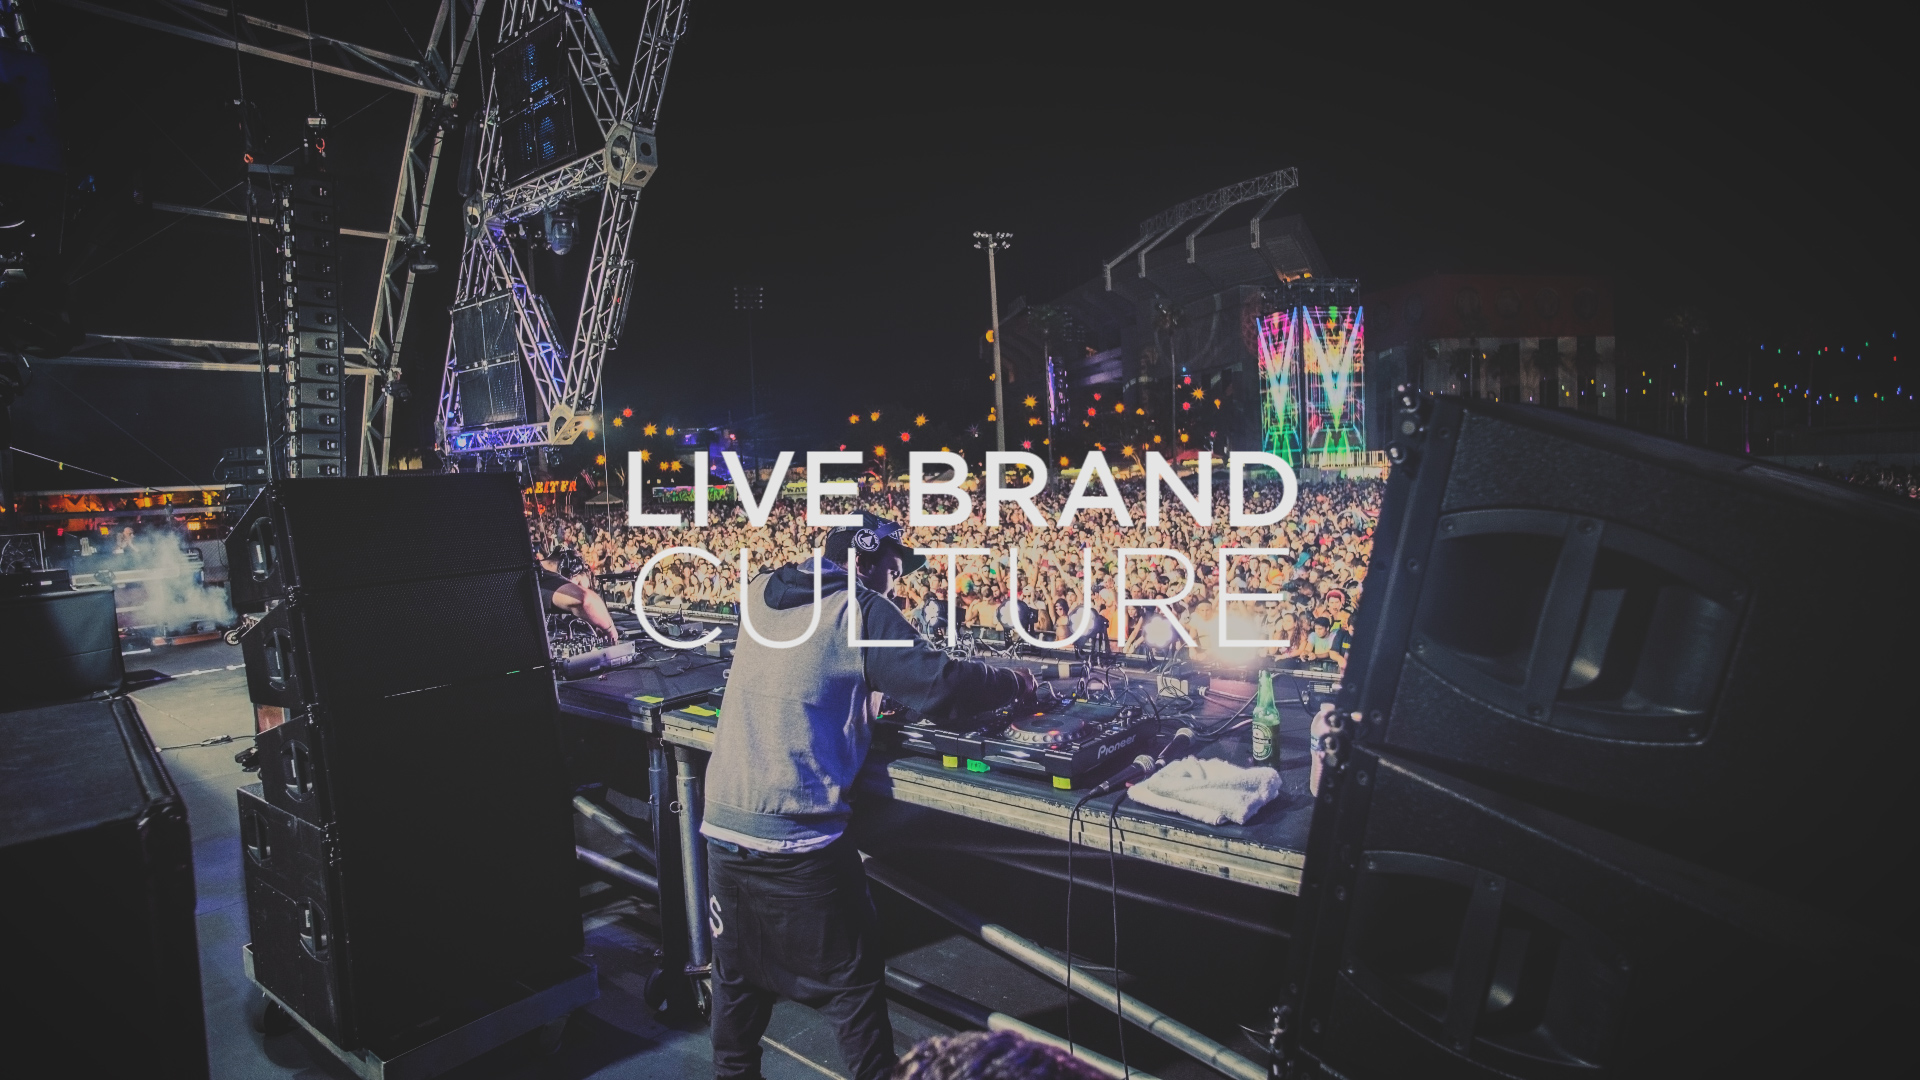 SEBUintl-EDC_2014-P3P-LIVE_BRAND_CULTURE-SEBU-001.jpg